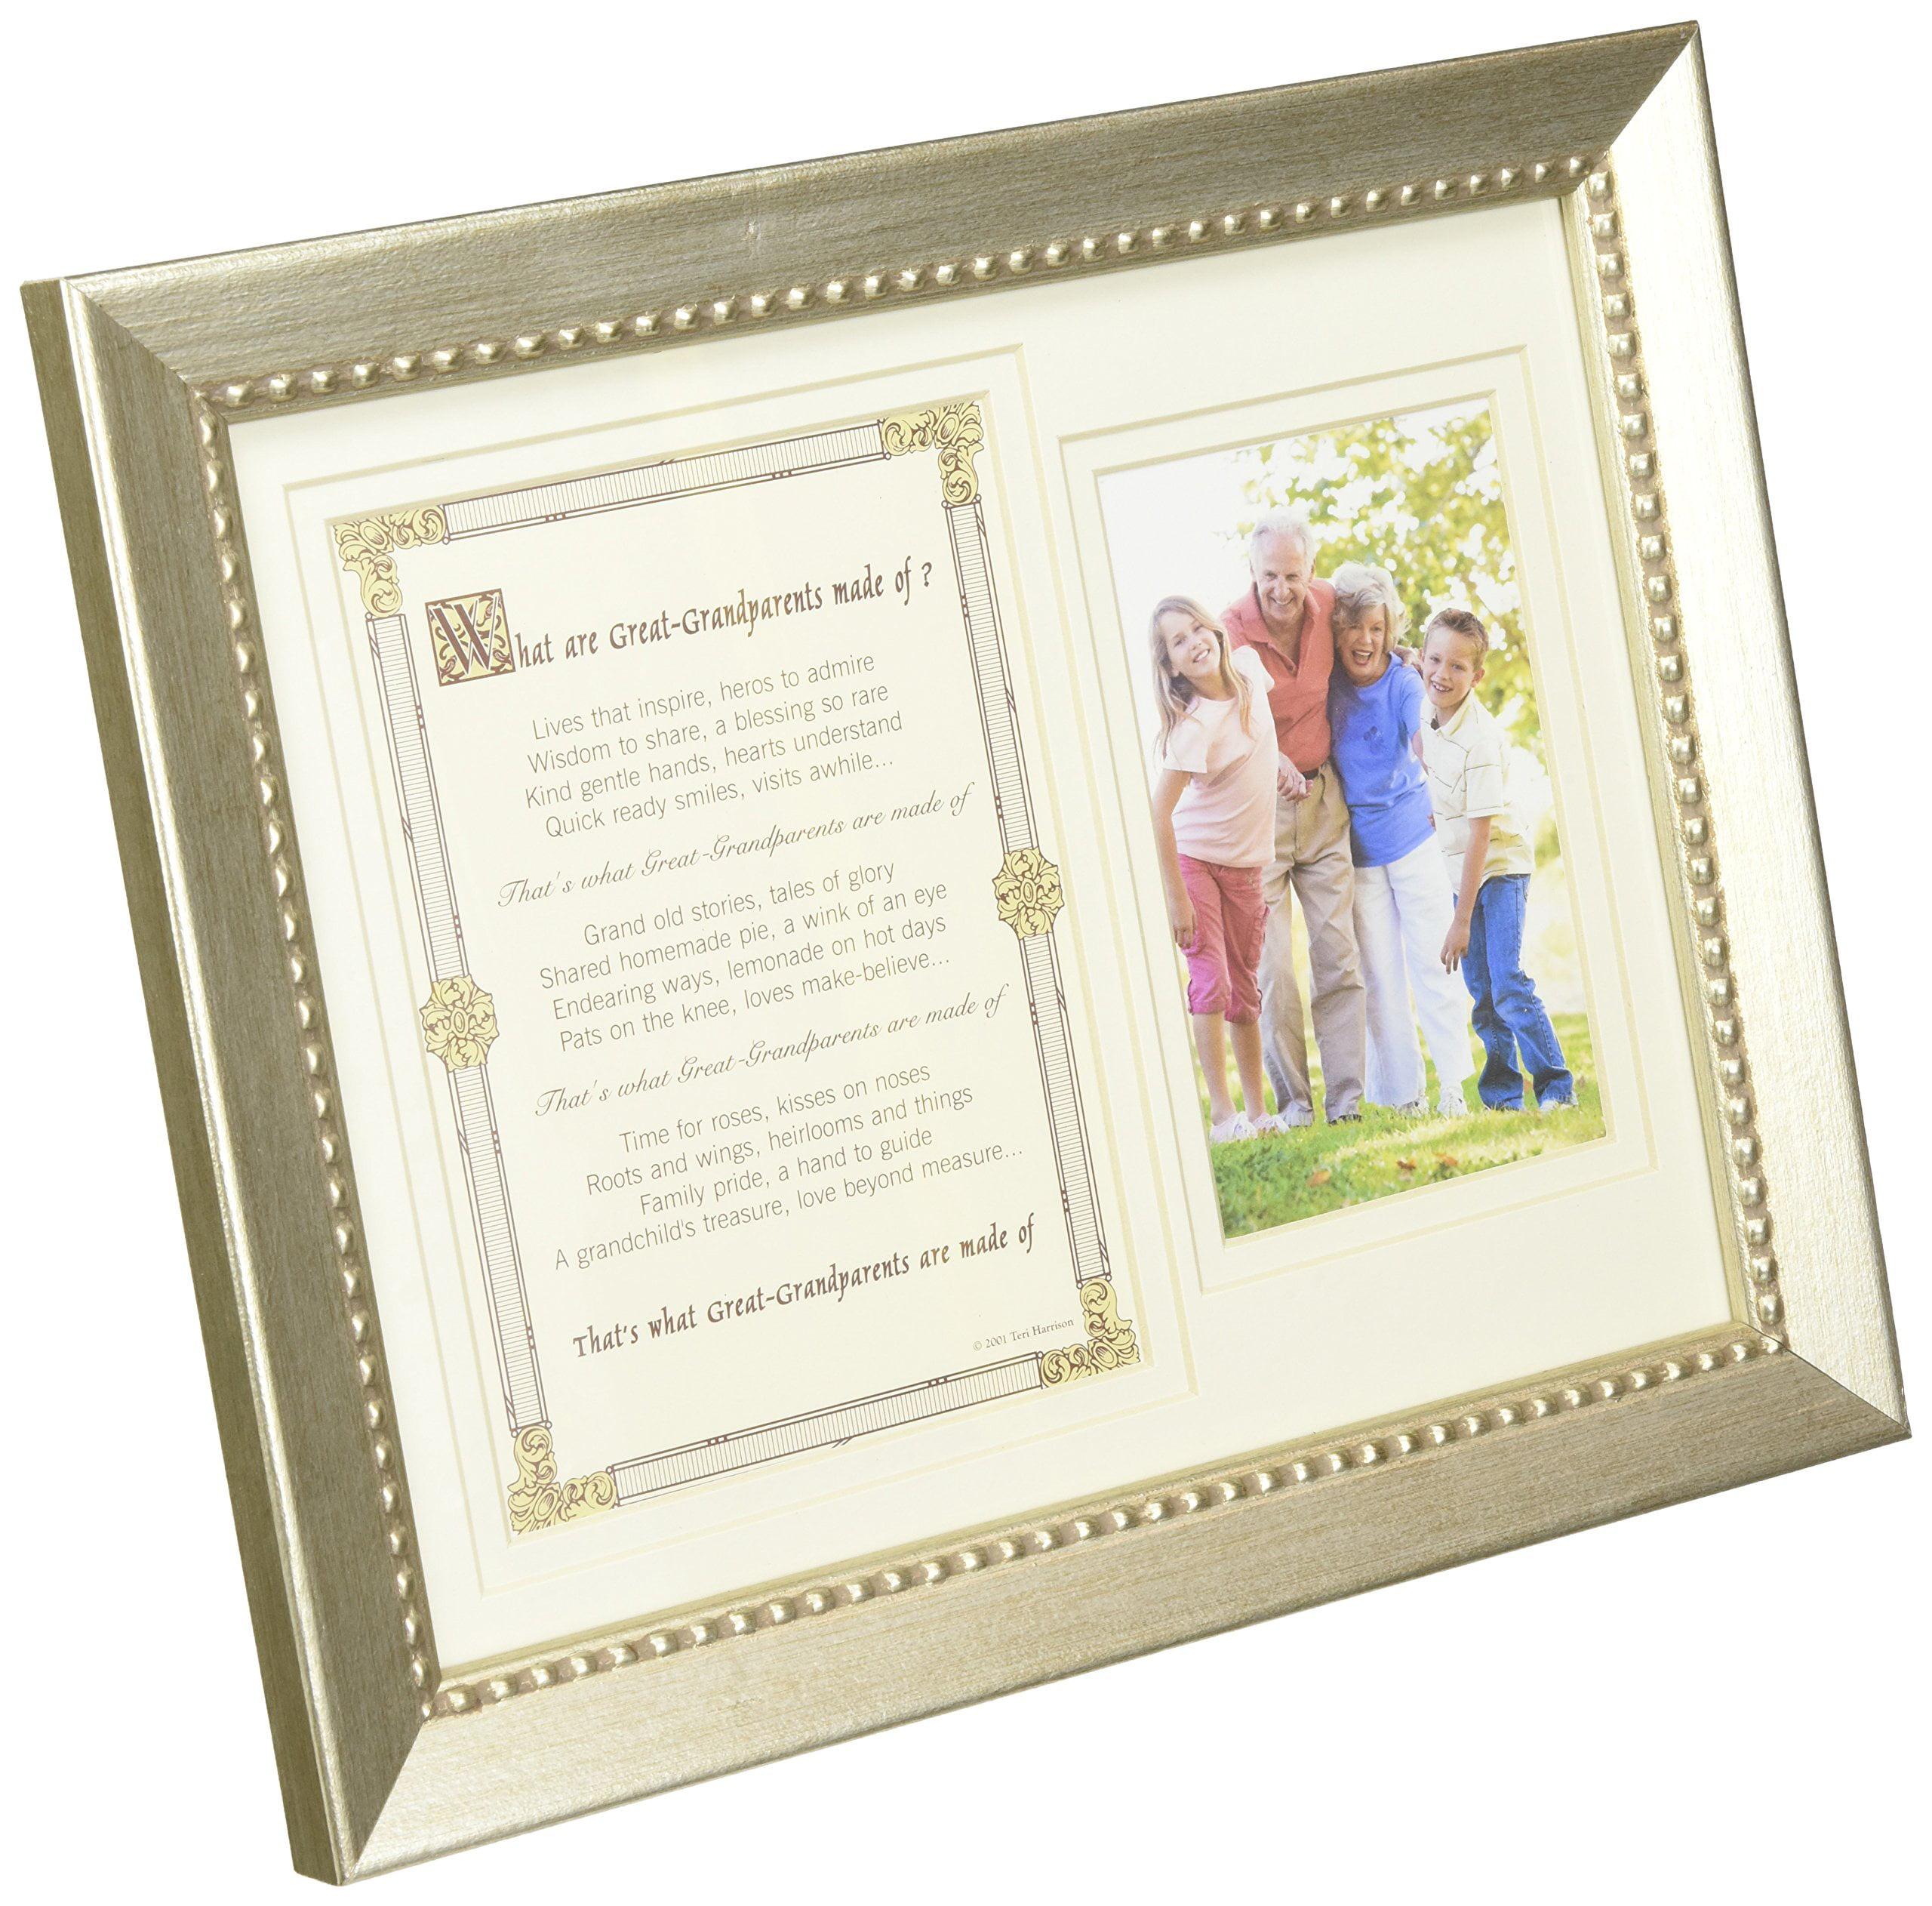 The Grandparent Gift Co, Great-Grandparents Photo Frame 8 x 10